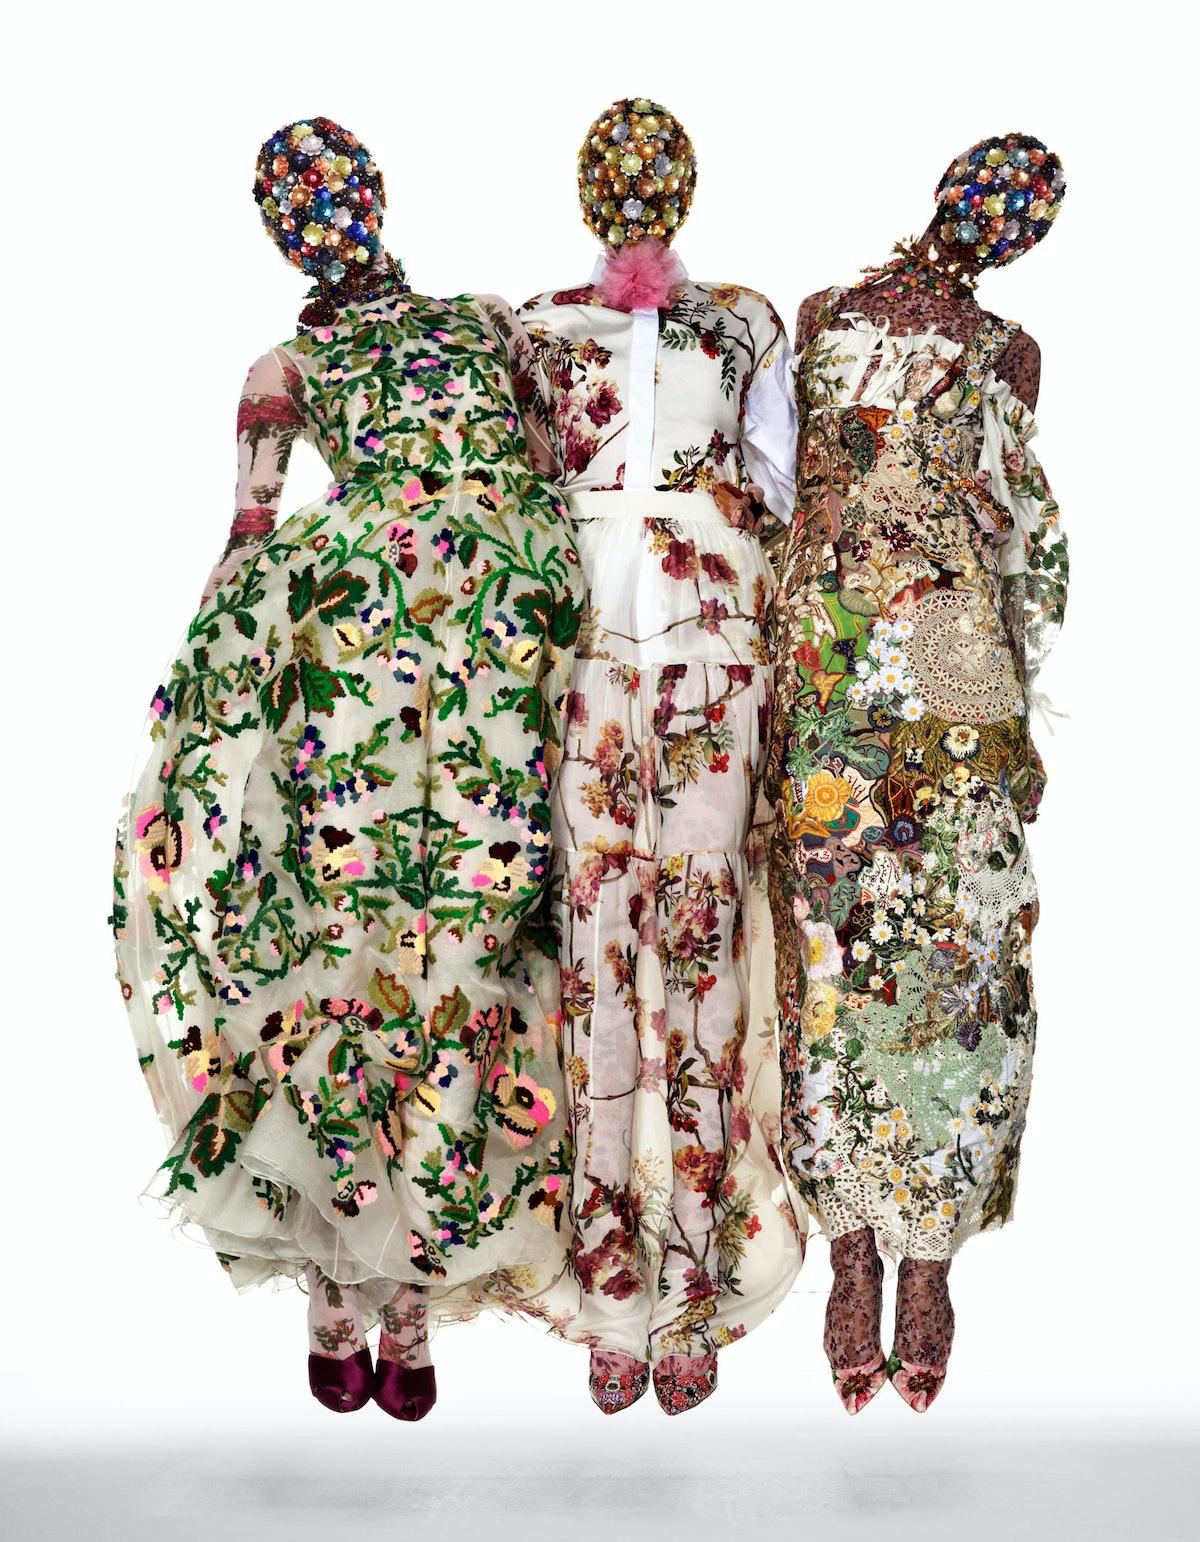 From left: Valentino gown; Erickson Beamon necklaces; Cosabella bodysuit; Giambattista Valli sandals...